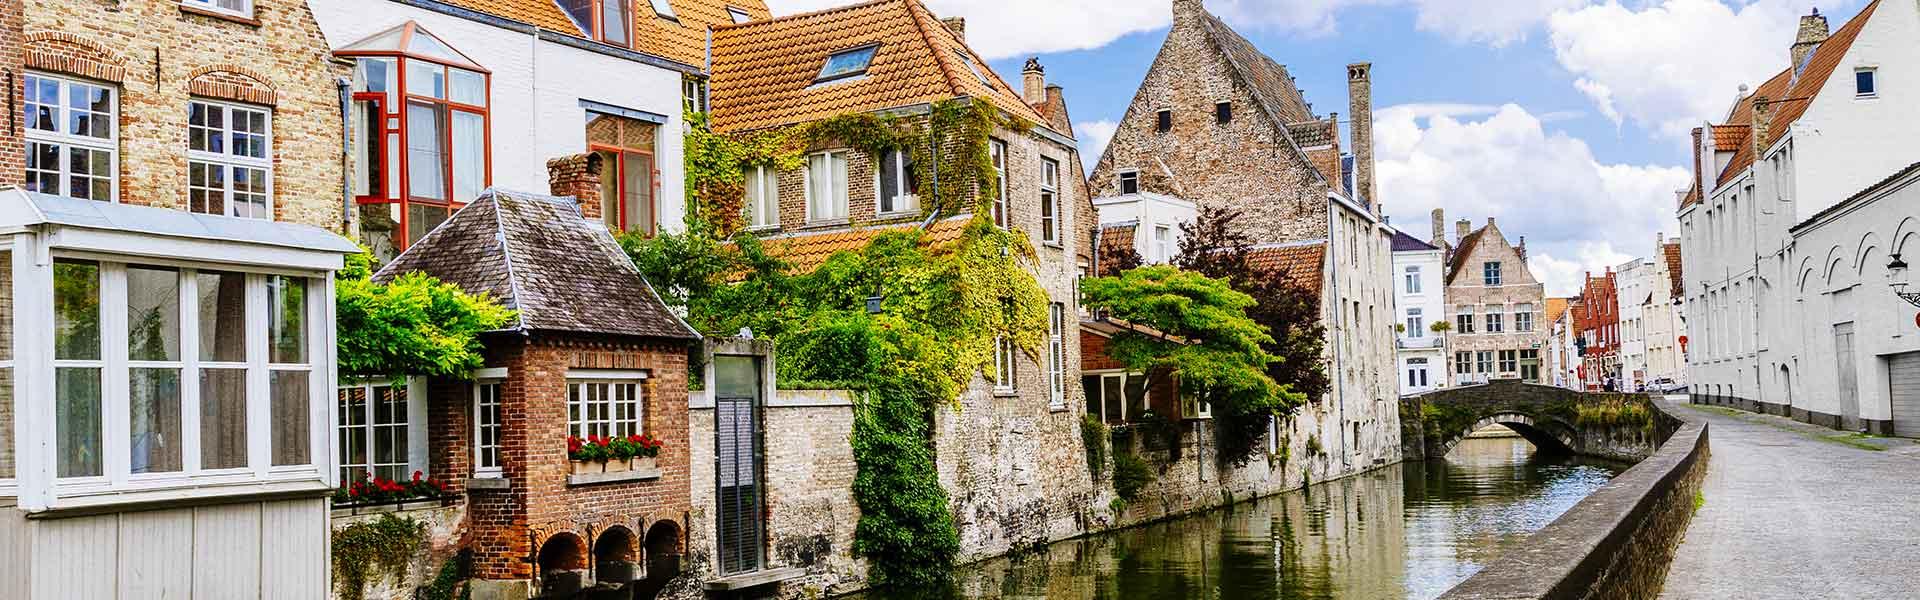 Canal de Bruges en Belgique